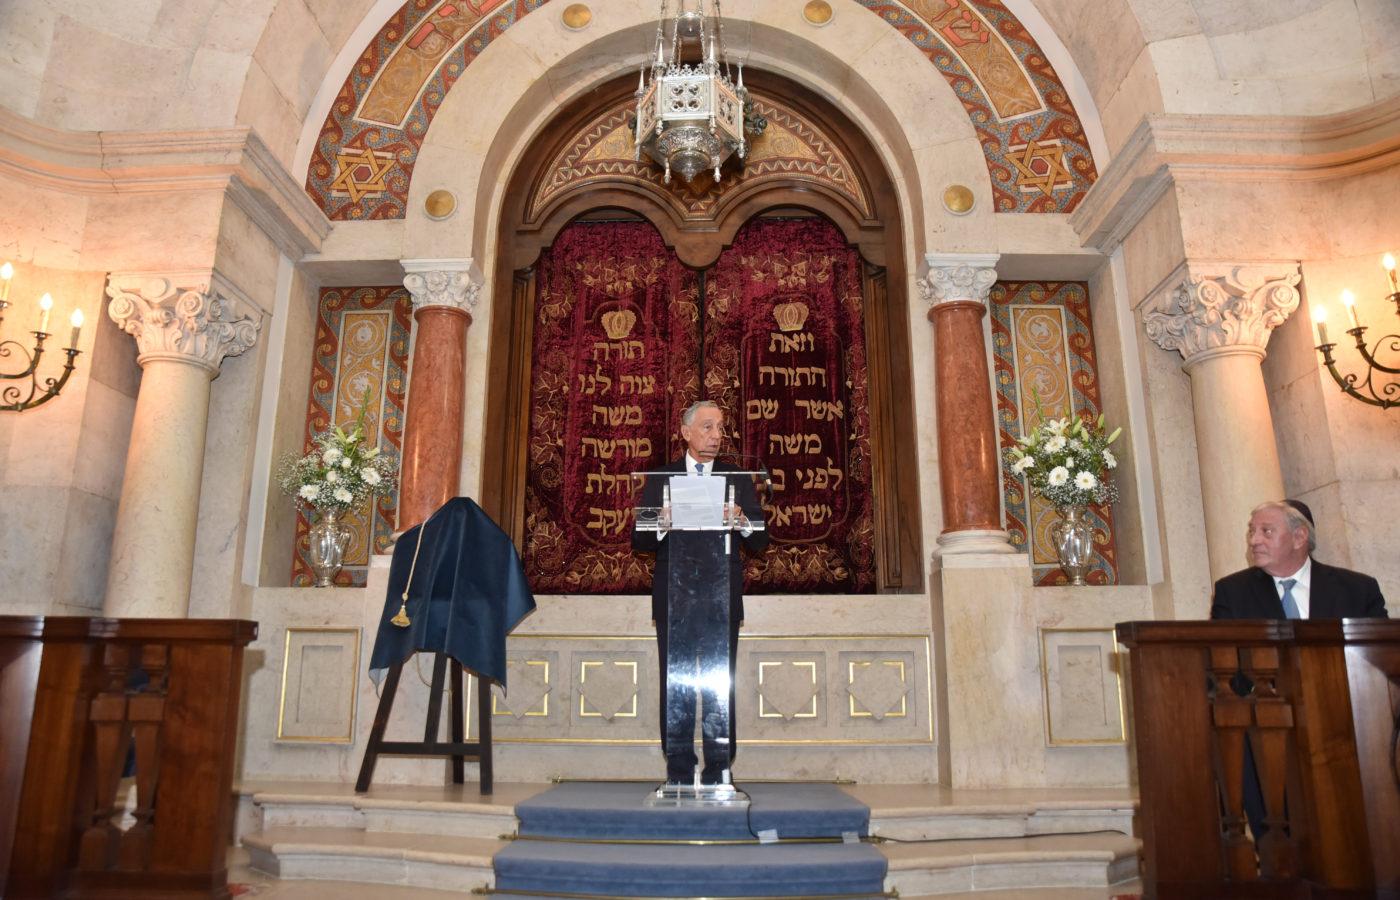 evento-sinagoga-282